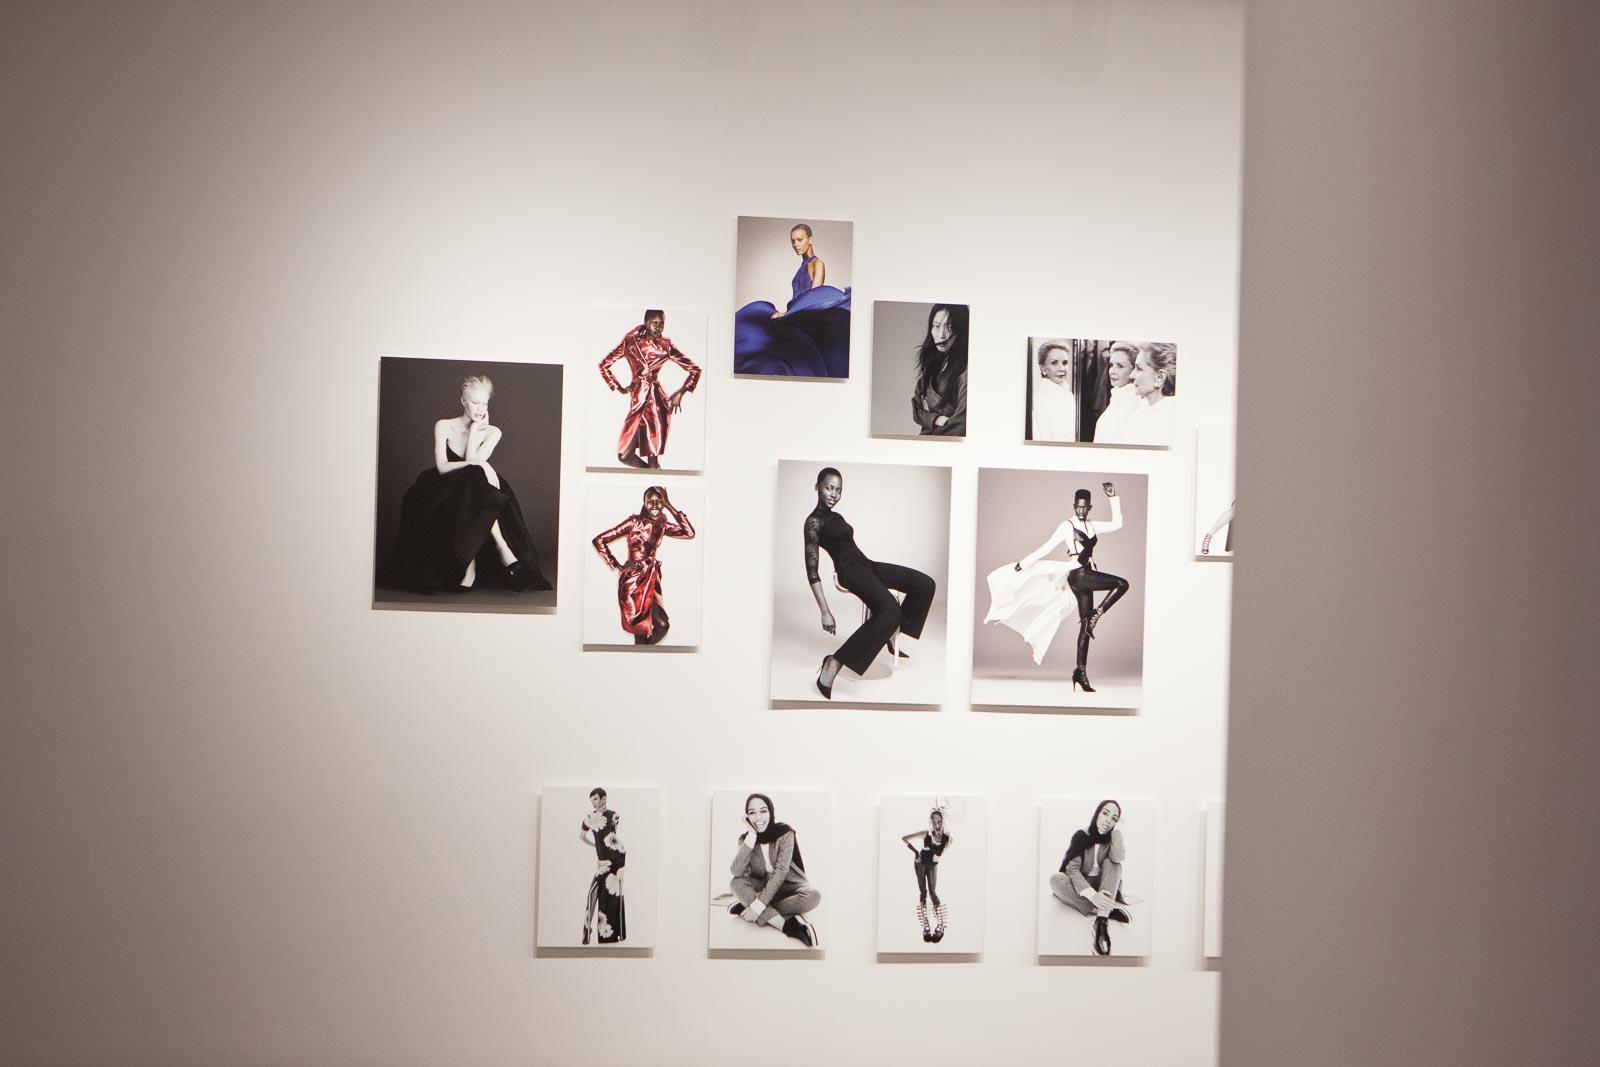 alexi-lubomirski-diverse-beauty-exhibition-robertiaga-15